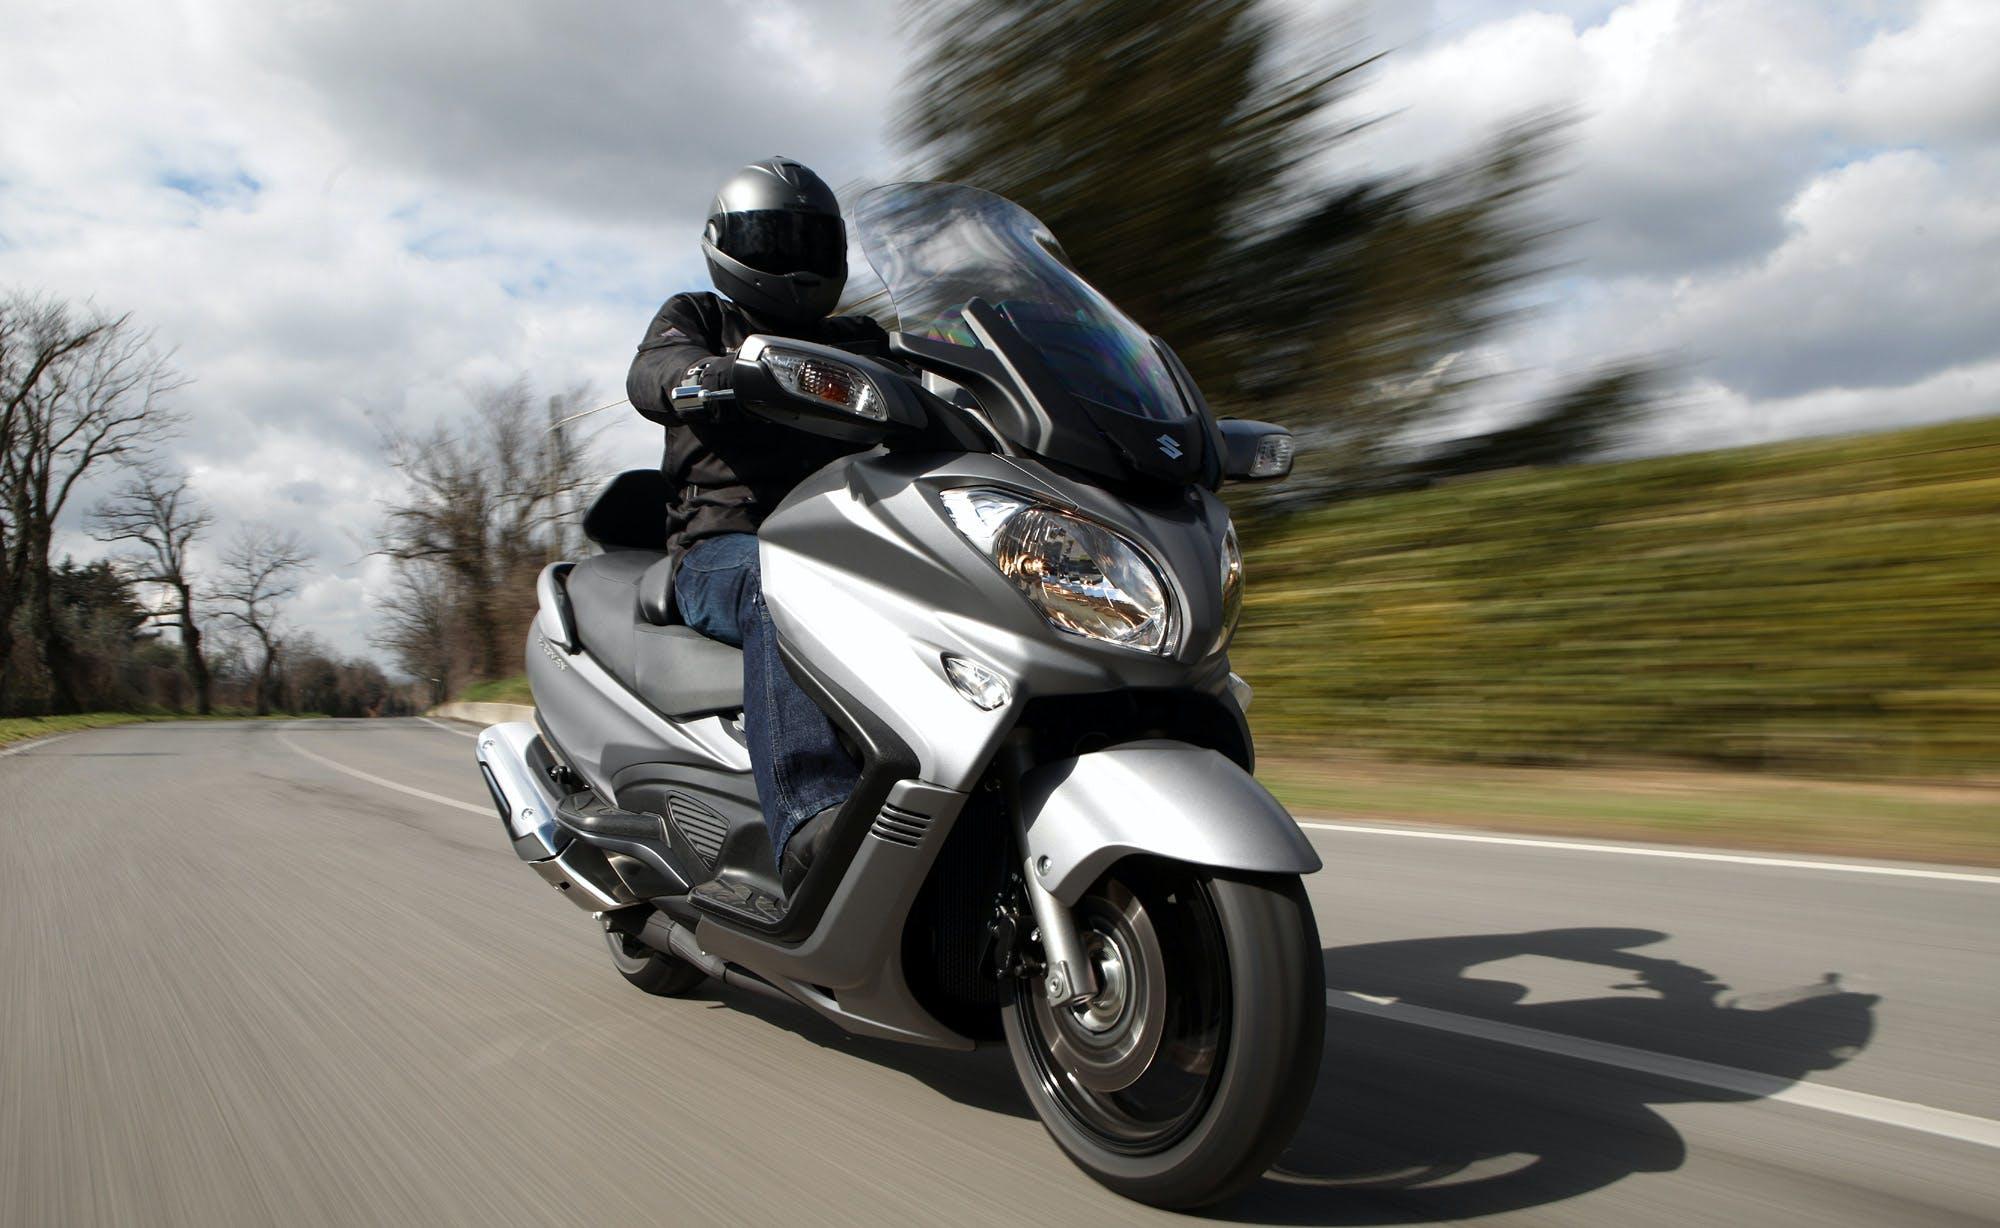 Suzuki Burgman 650 Executive migliori maxi scooter